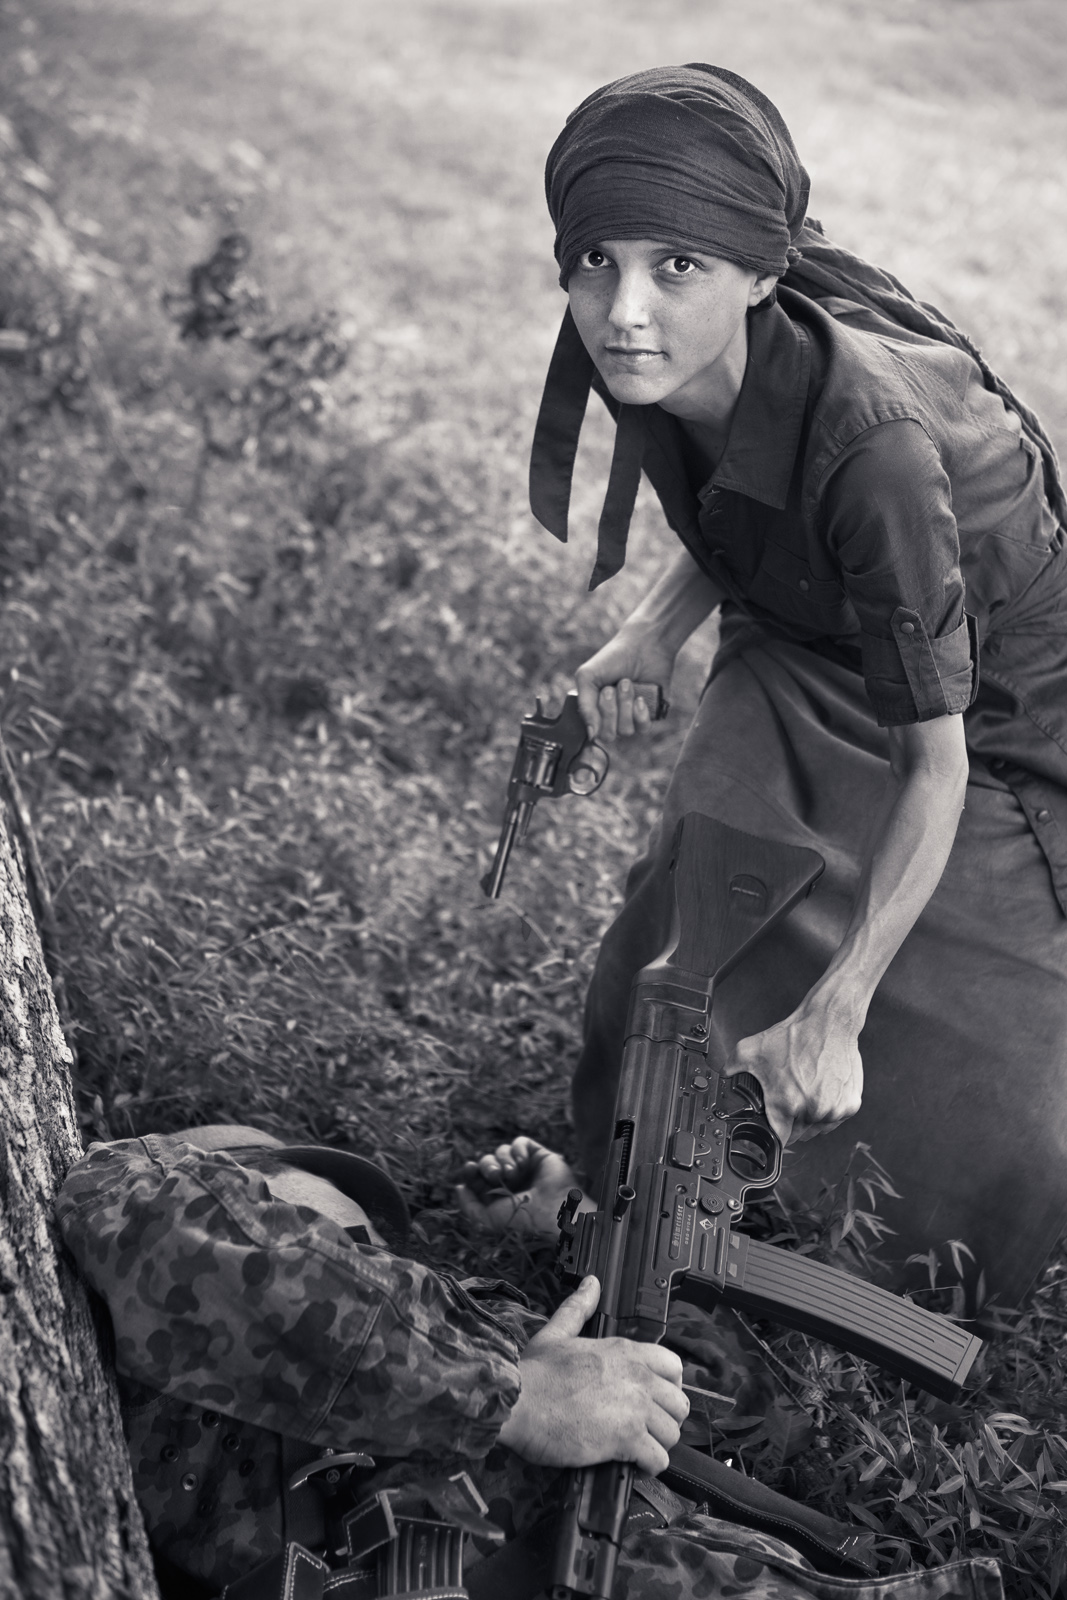 gsg sturmgewehr 44 in 22lr world war classic reborn as fun plinker